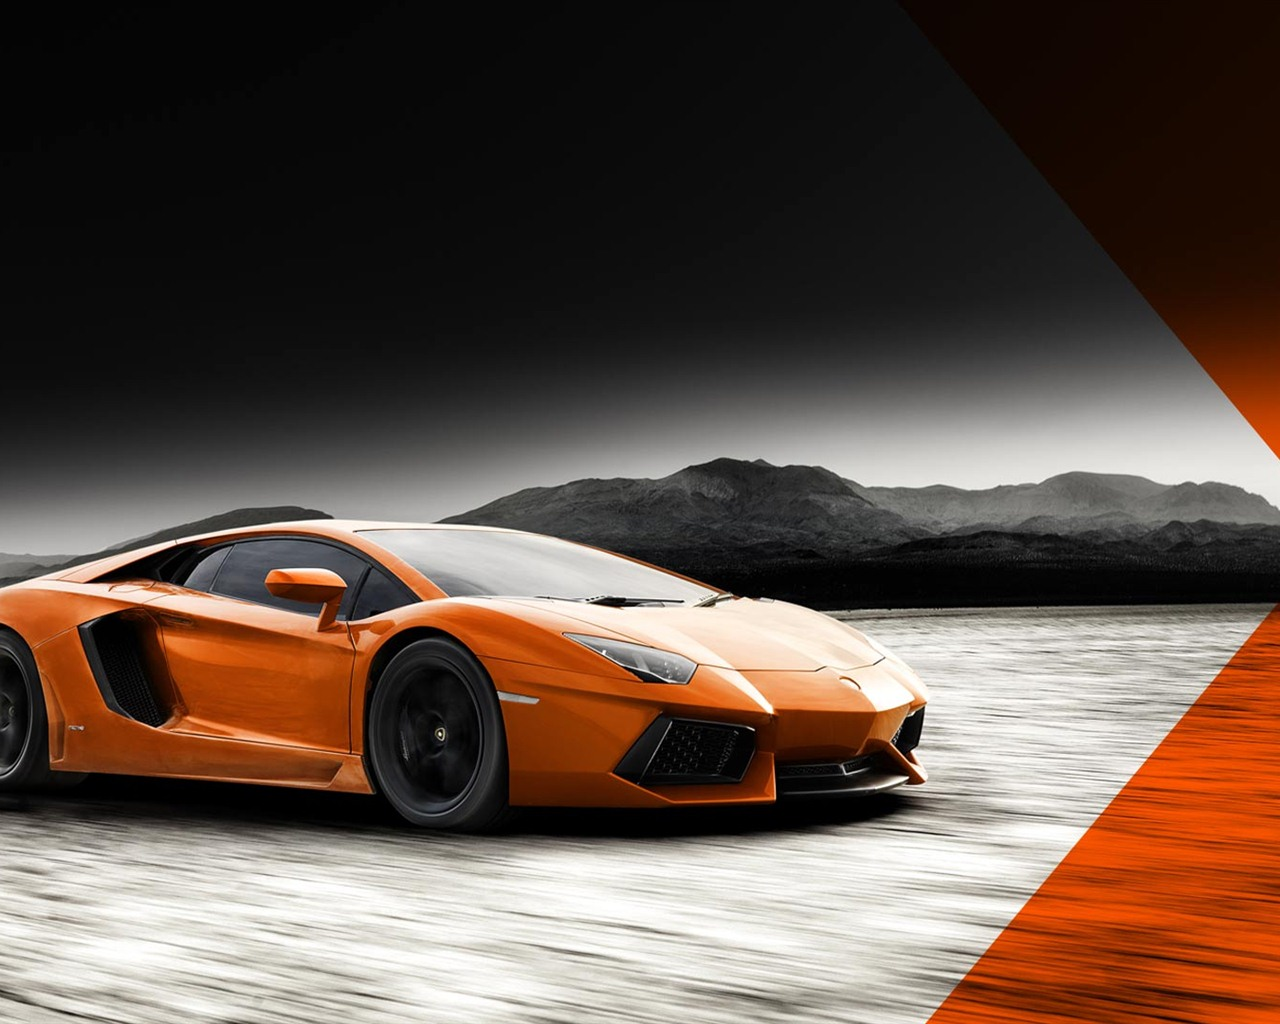 2012 Lamborghini Aventador Lp700 4 Hd Wallpaper 30